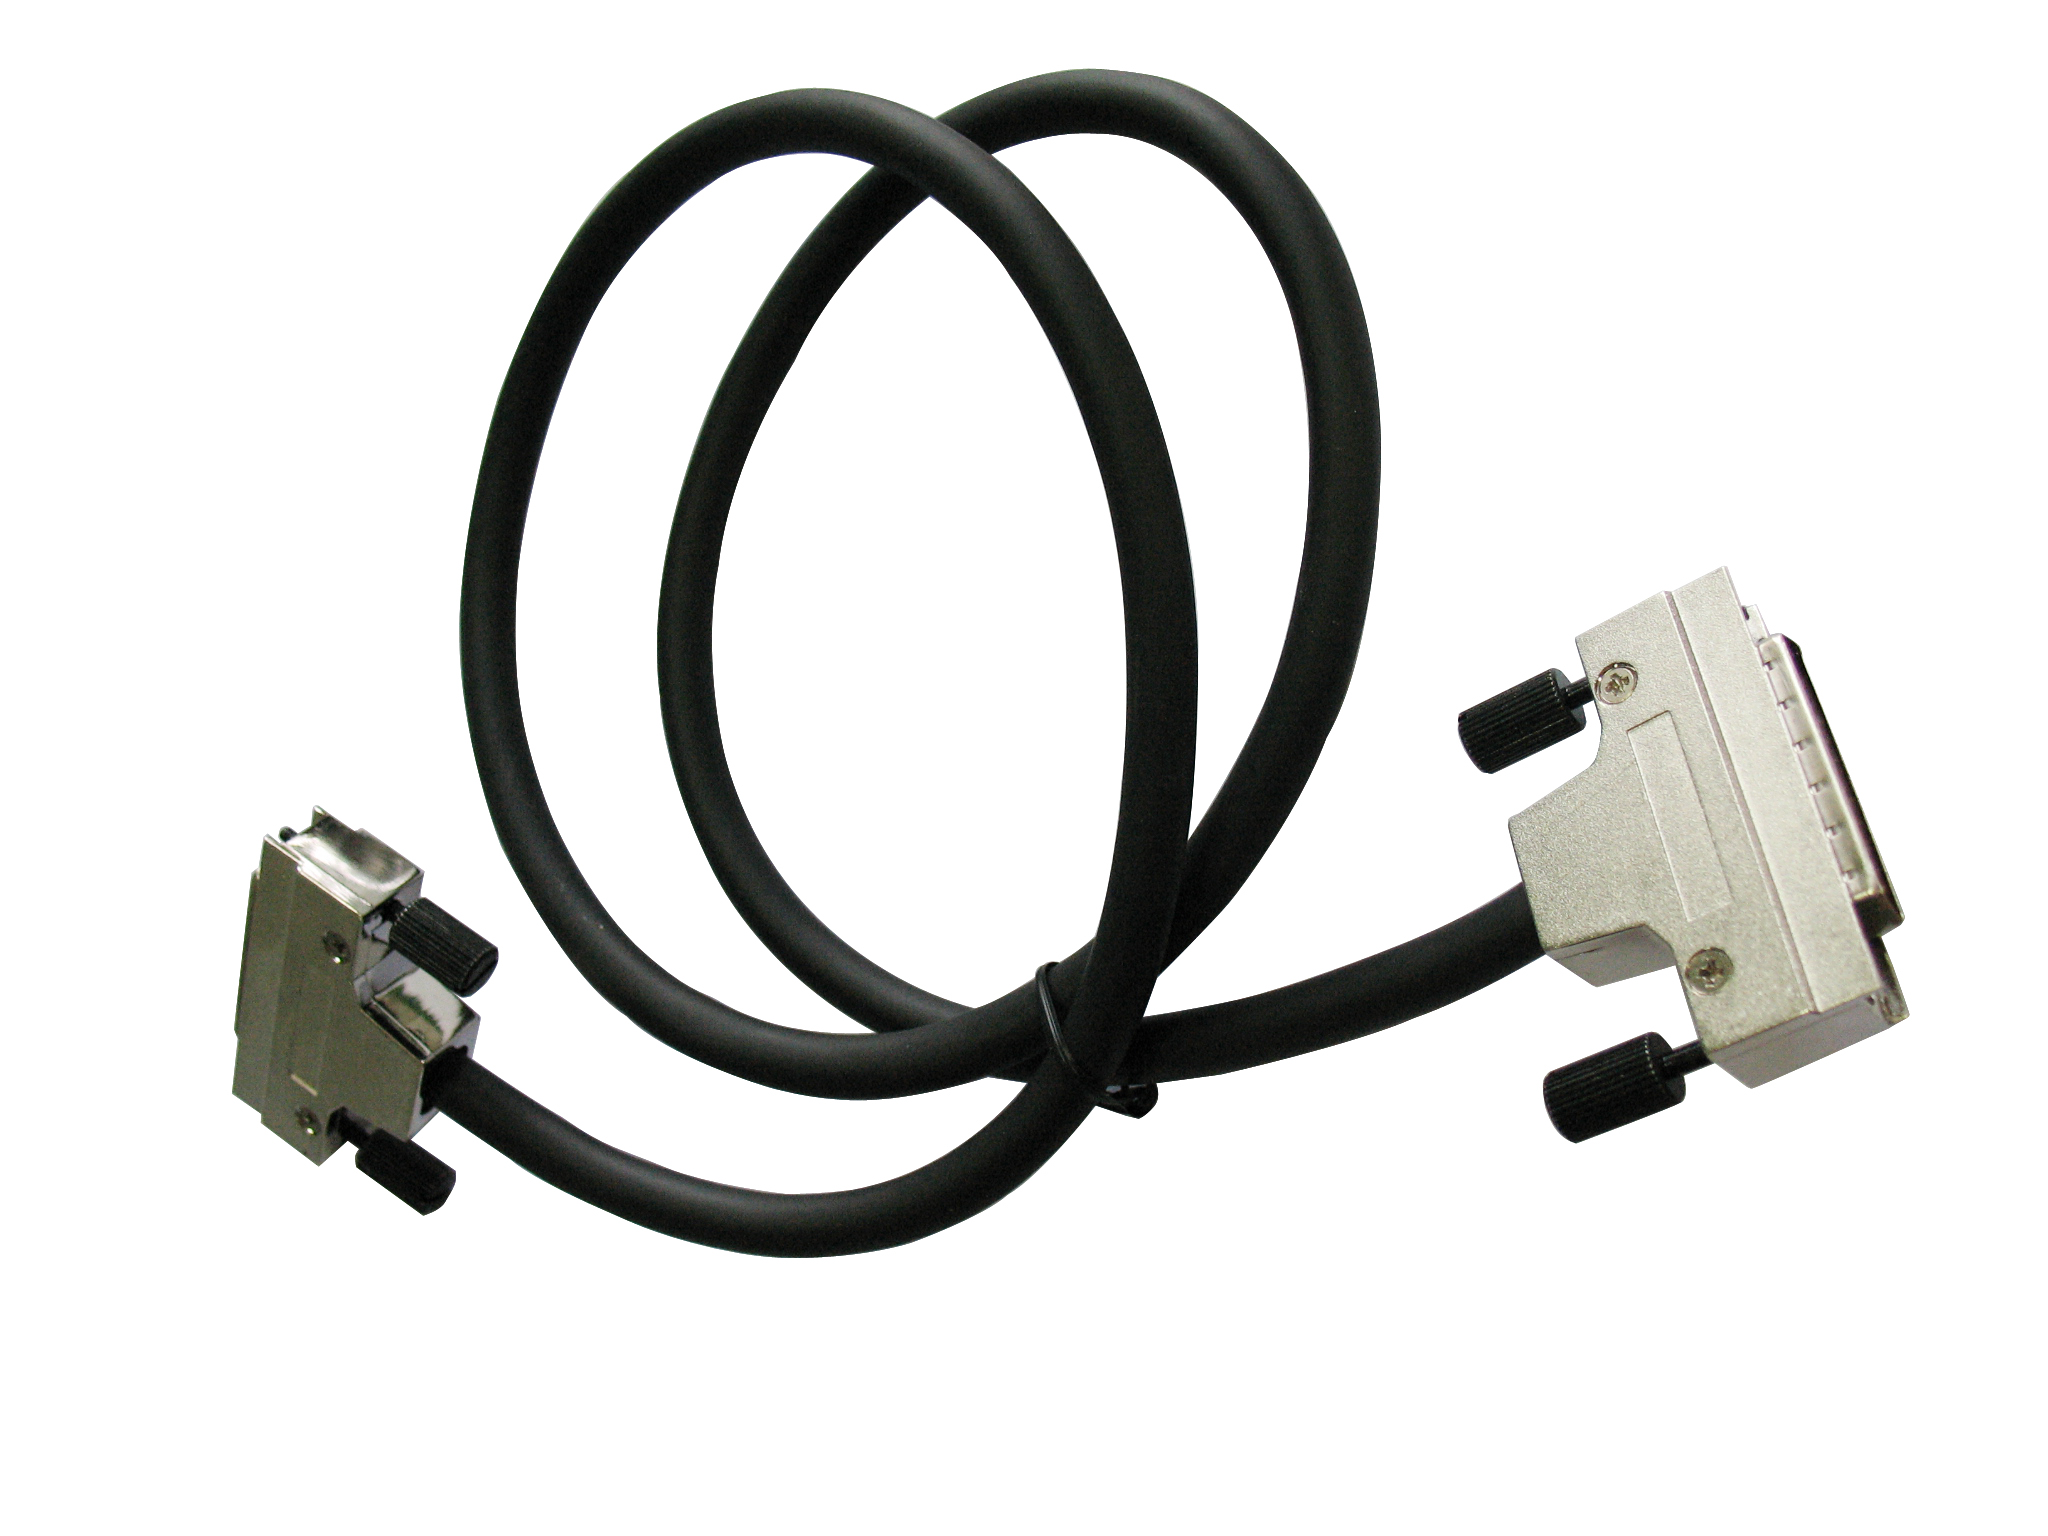 ART-阿尔泰A50D专用线缆-配套A50D接线端子板